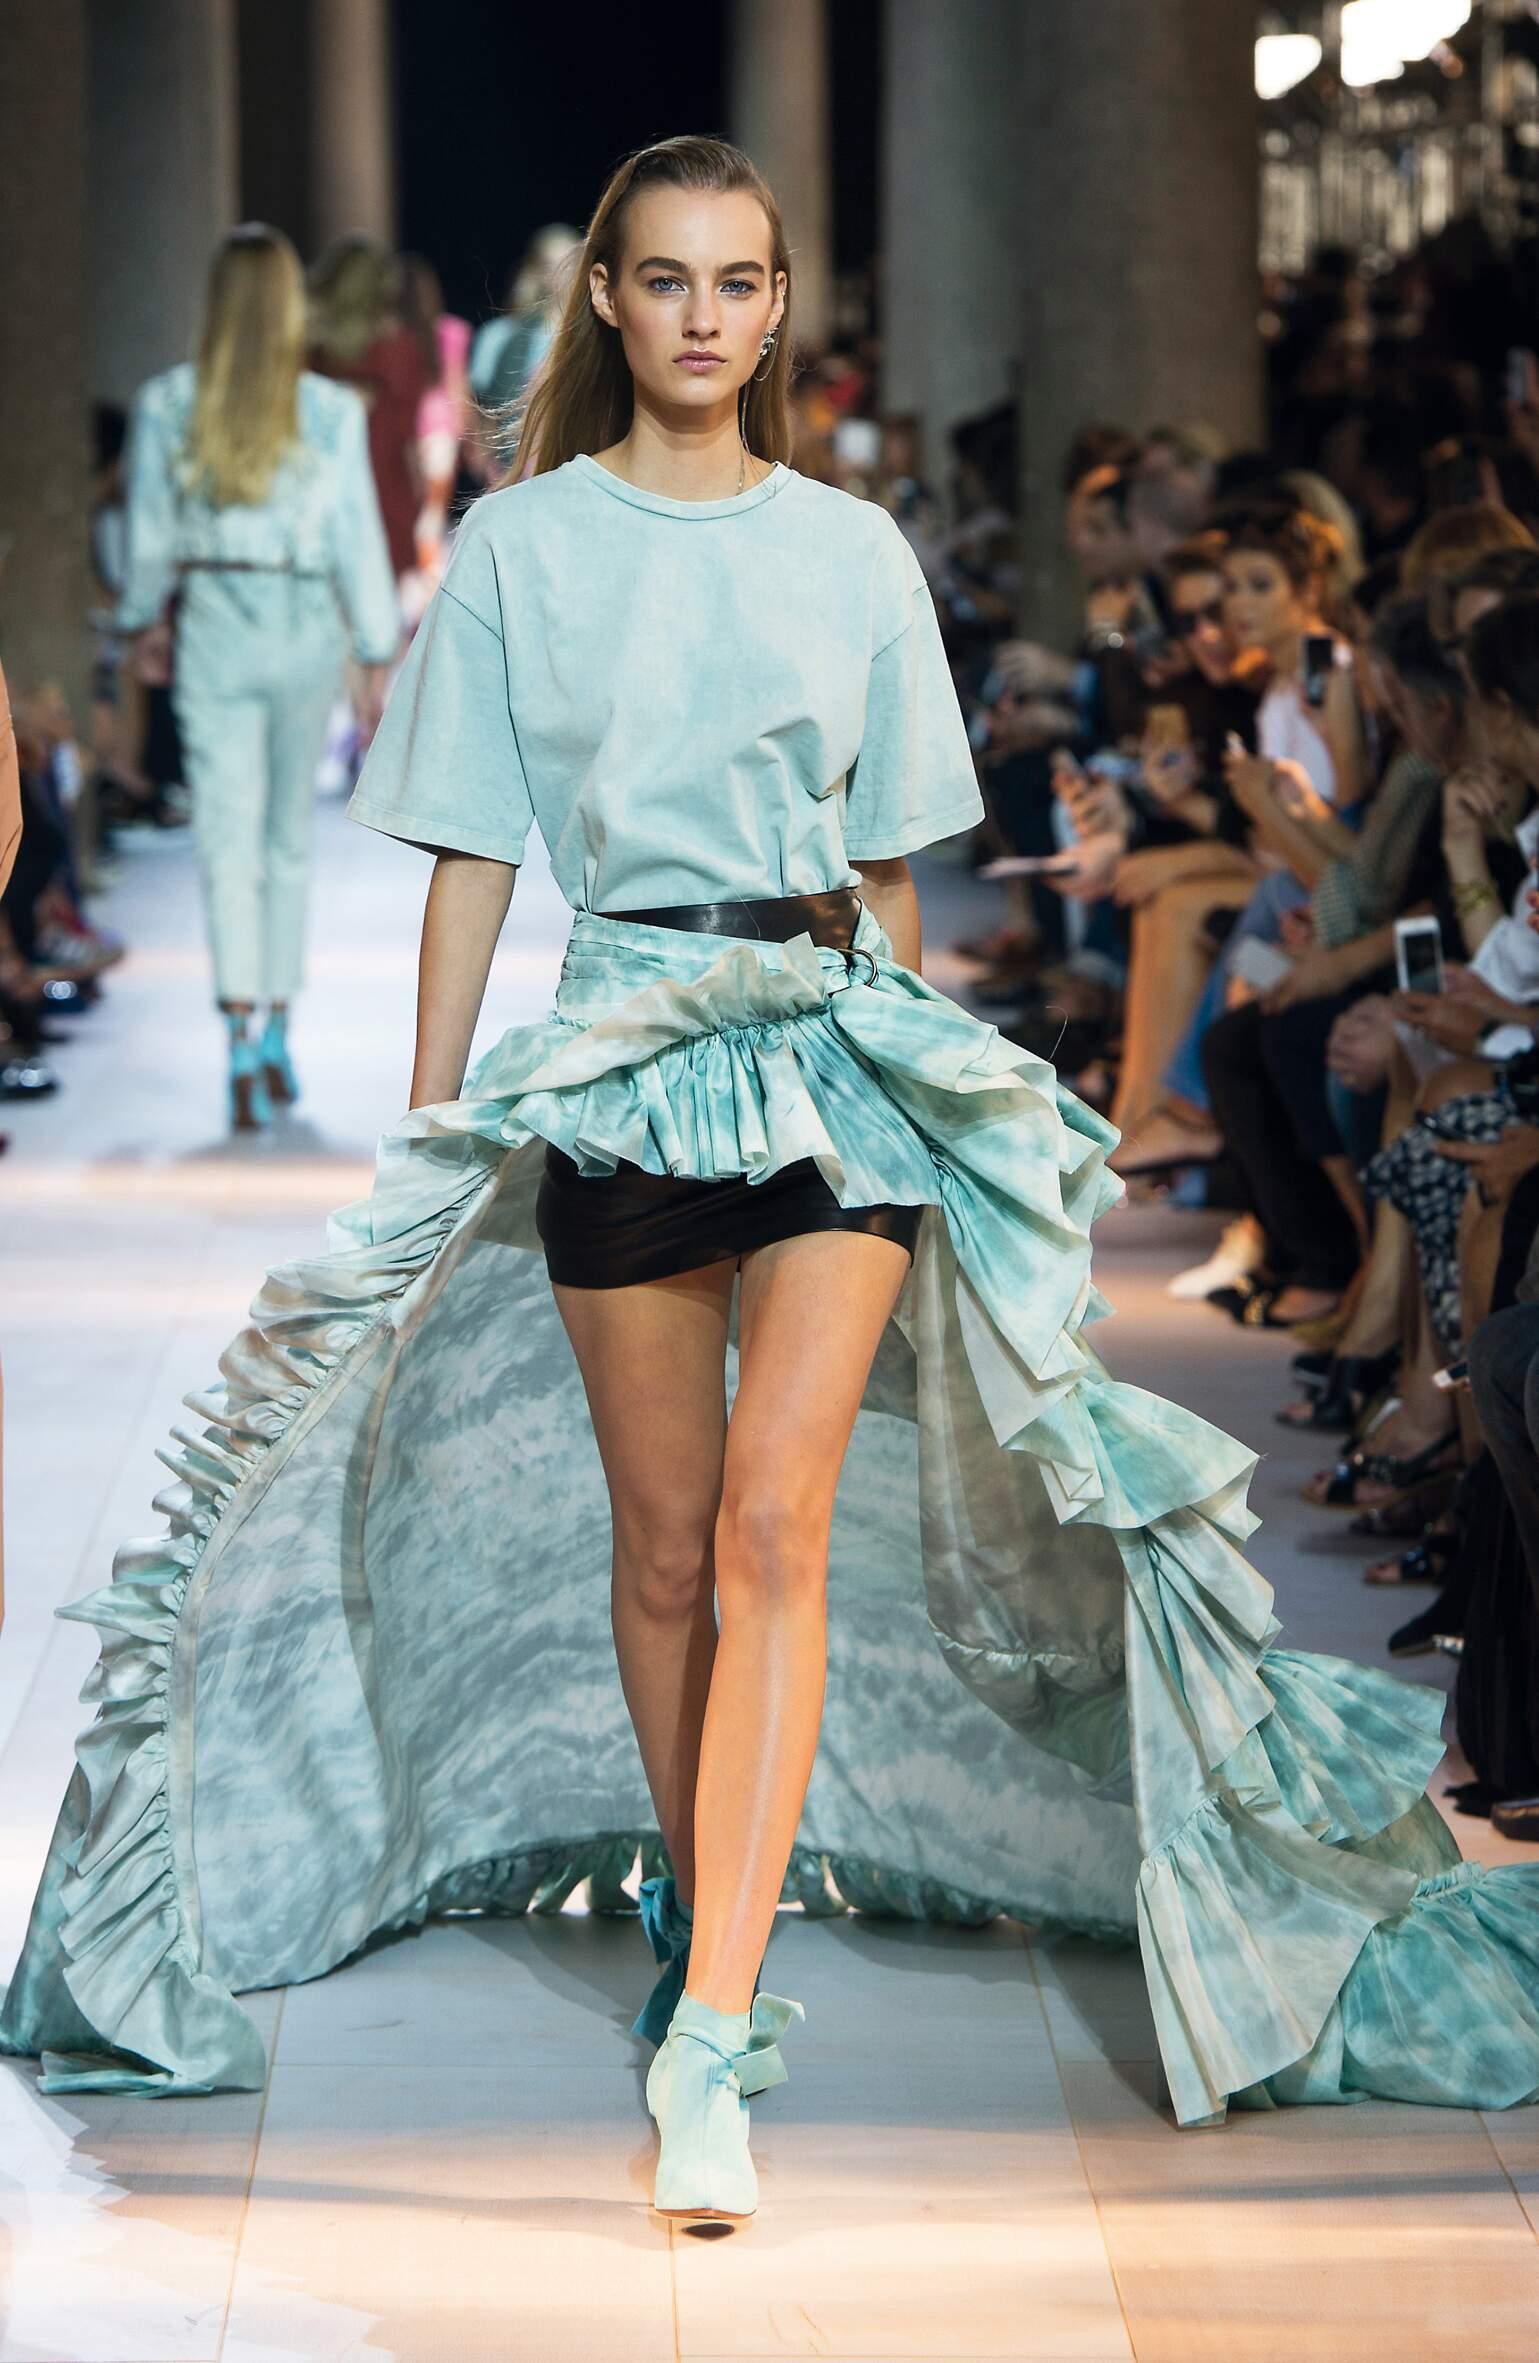 Spring 2016 Woman Fashion Show Roberto Cavalli